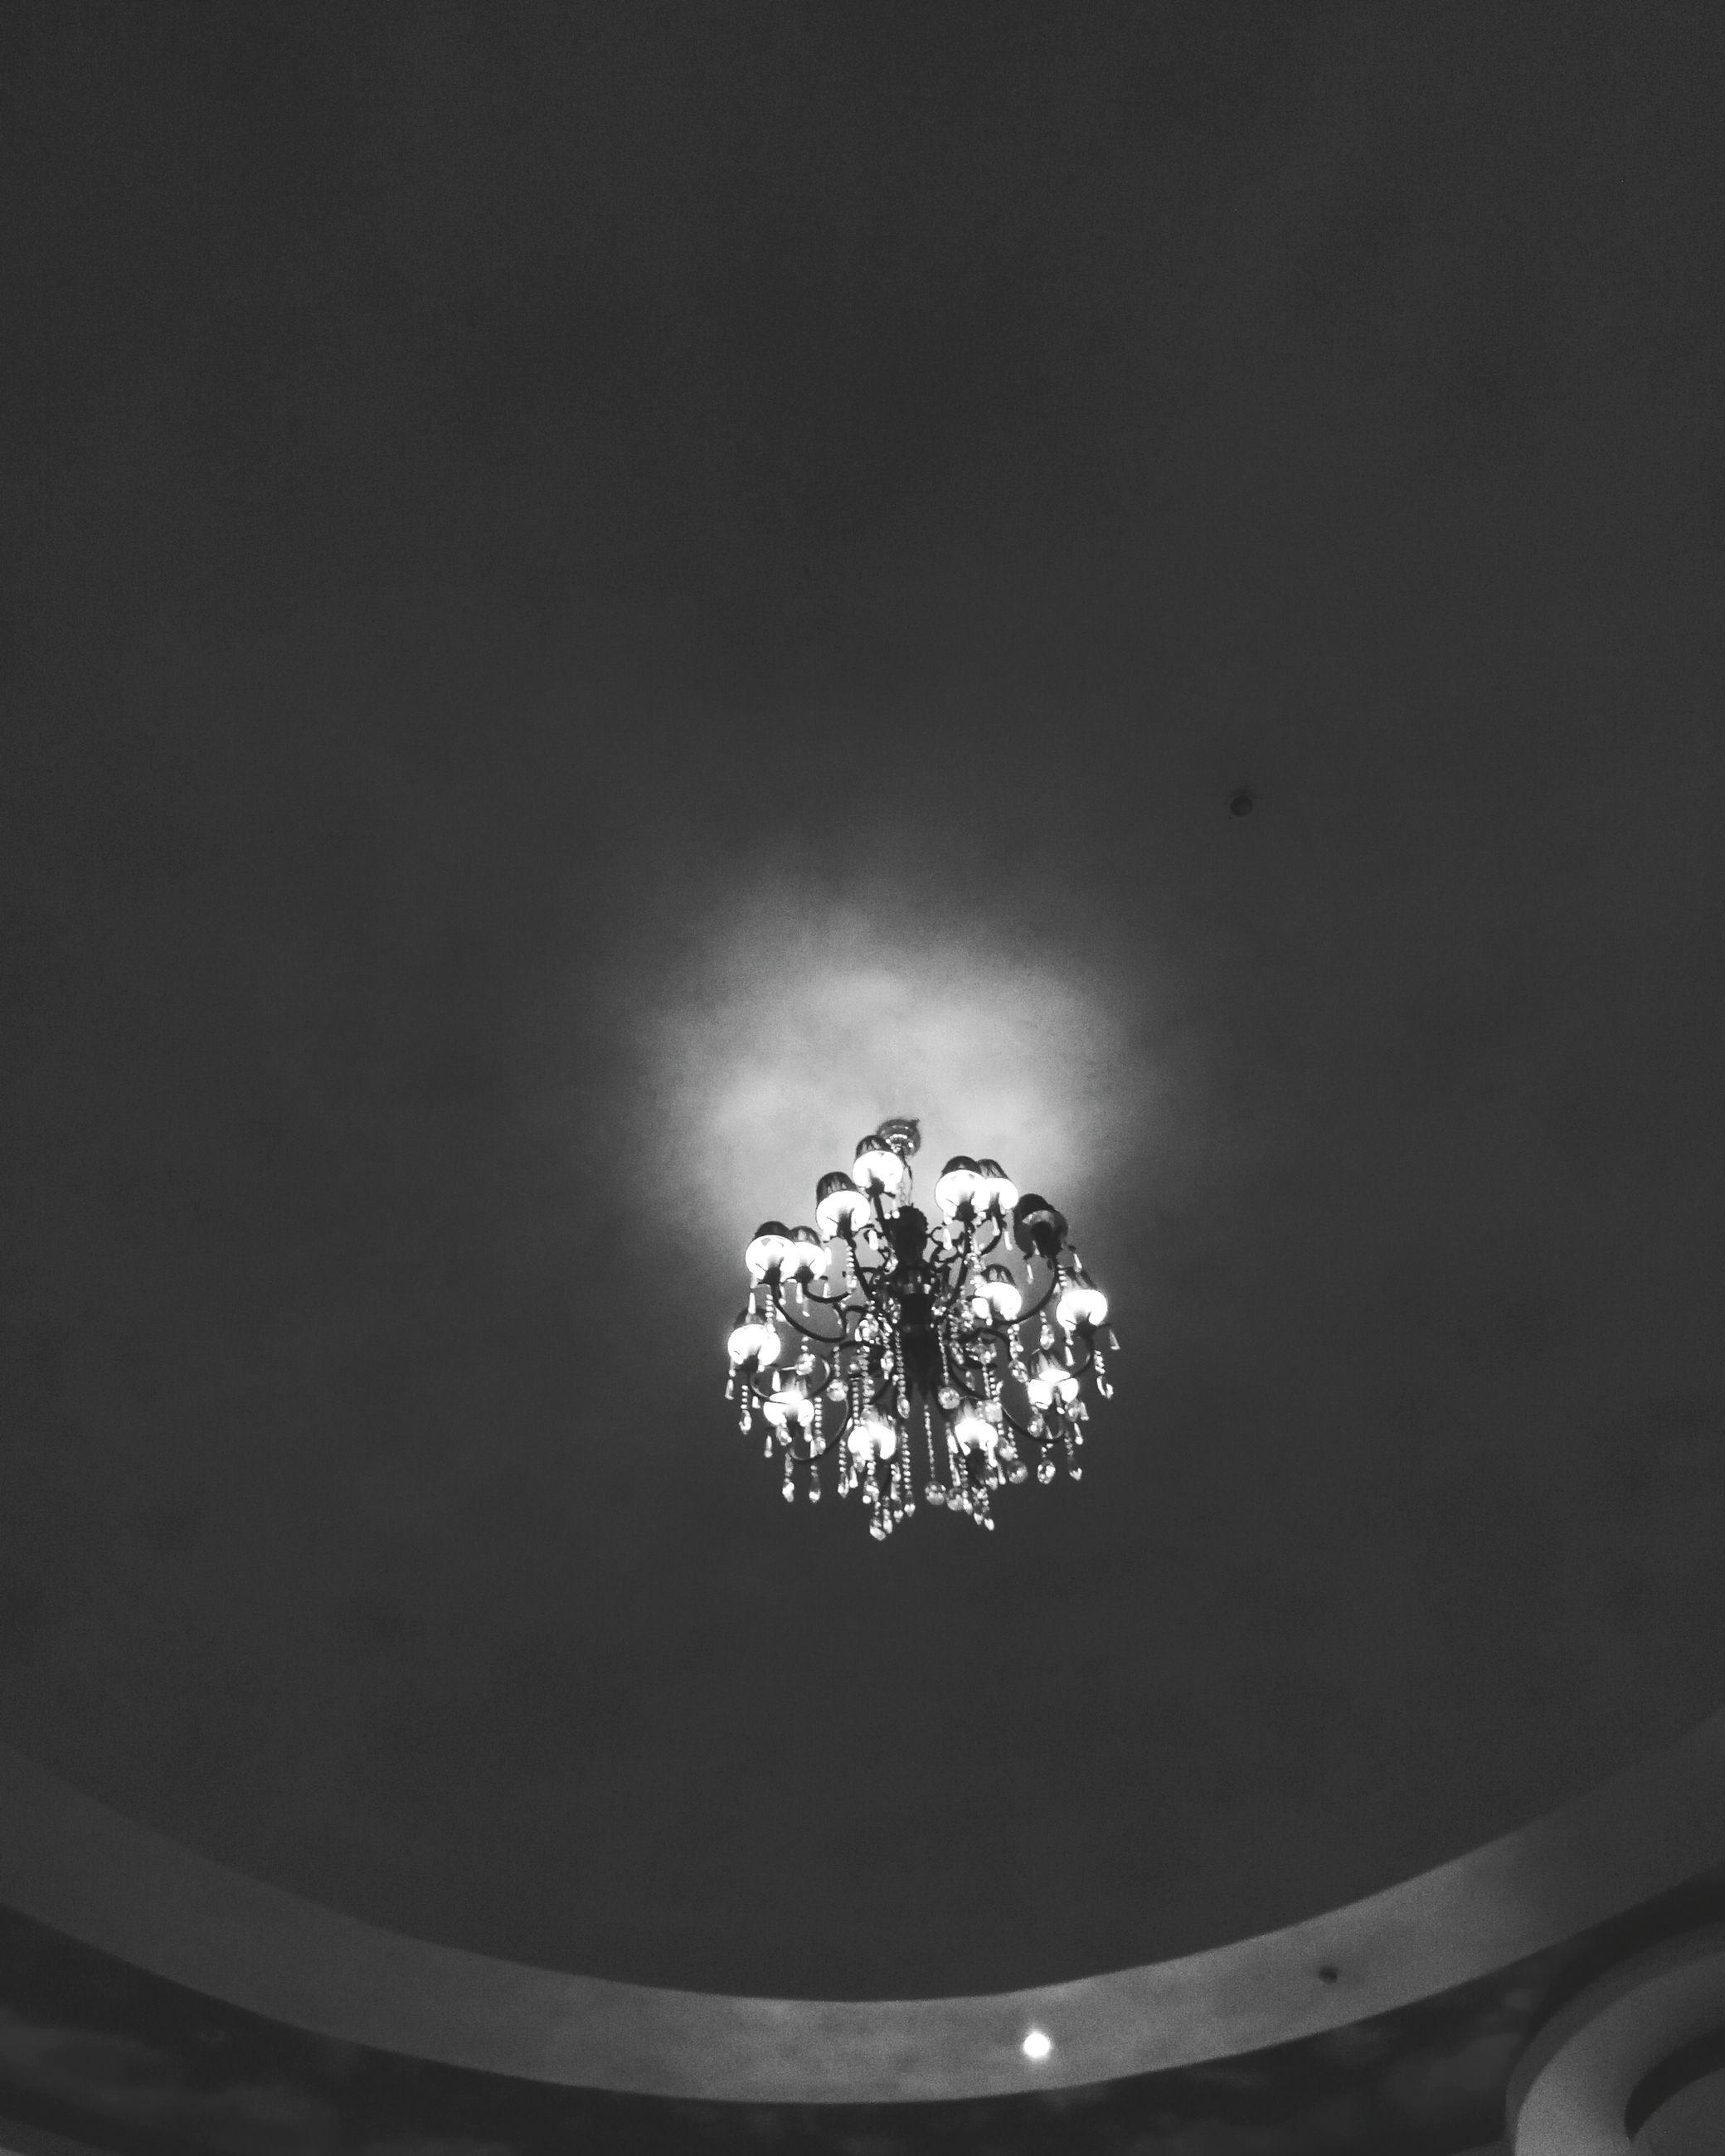 no people, illuminated, flower, indoors, night, low angle view, studio shot, close-up, nature